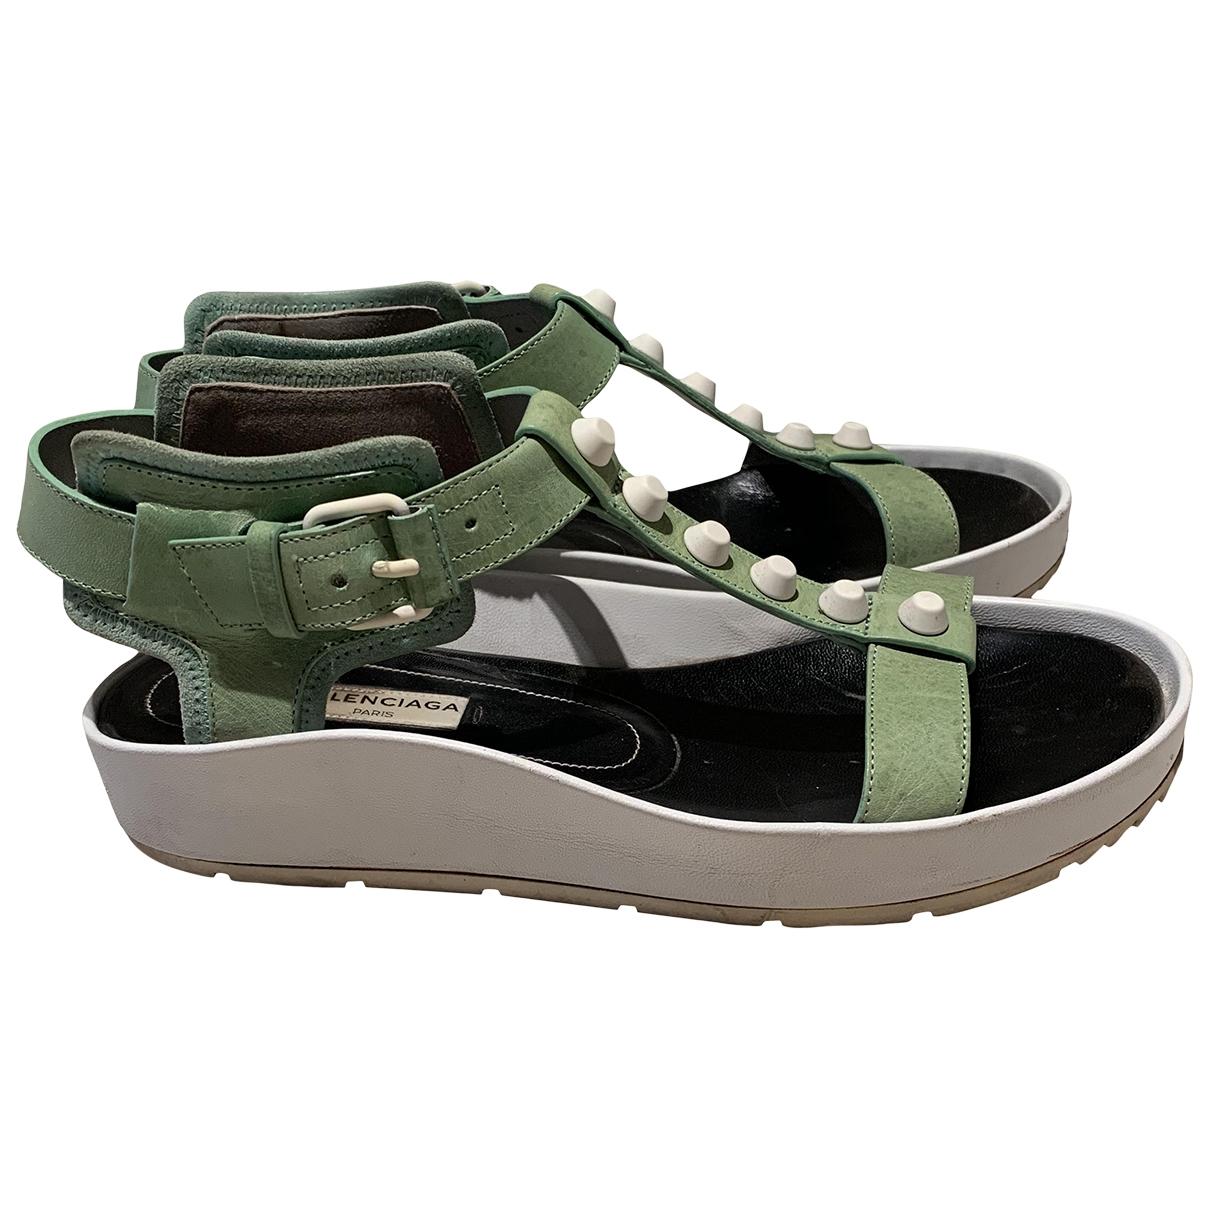 Balenciaga - Sandales   pour femme en cuir - vert